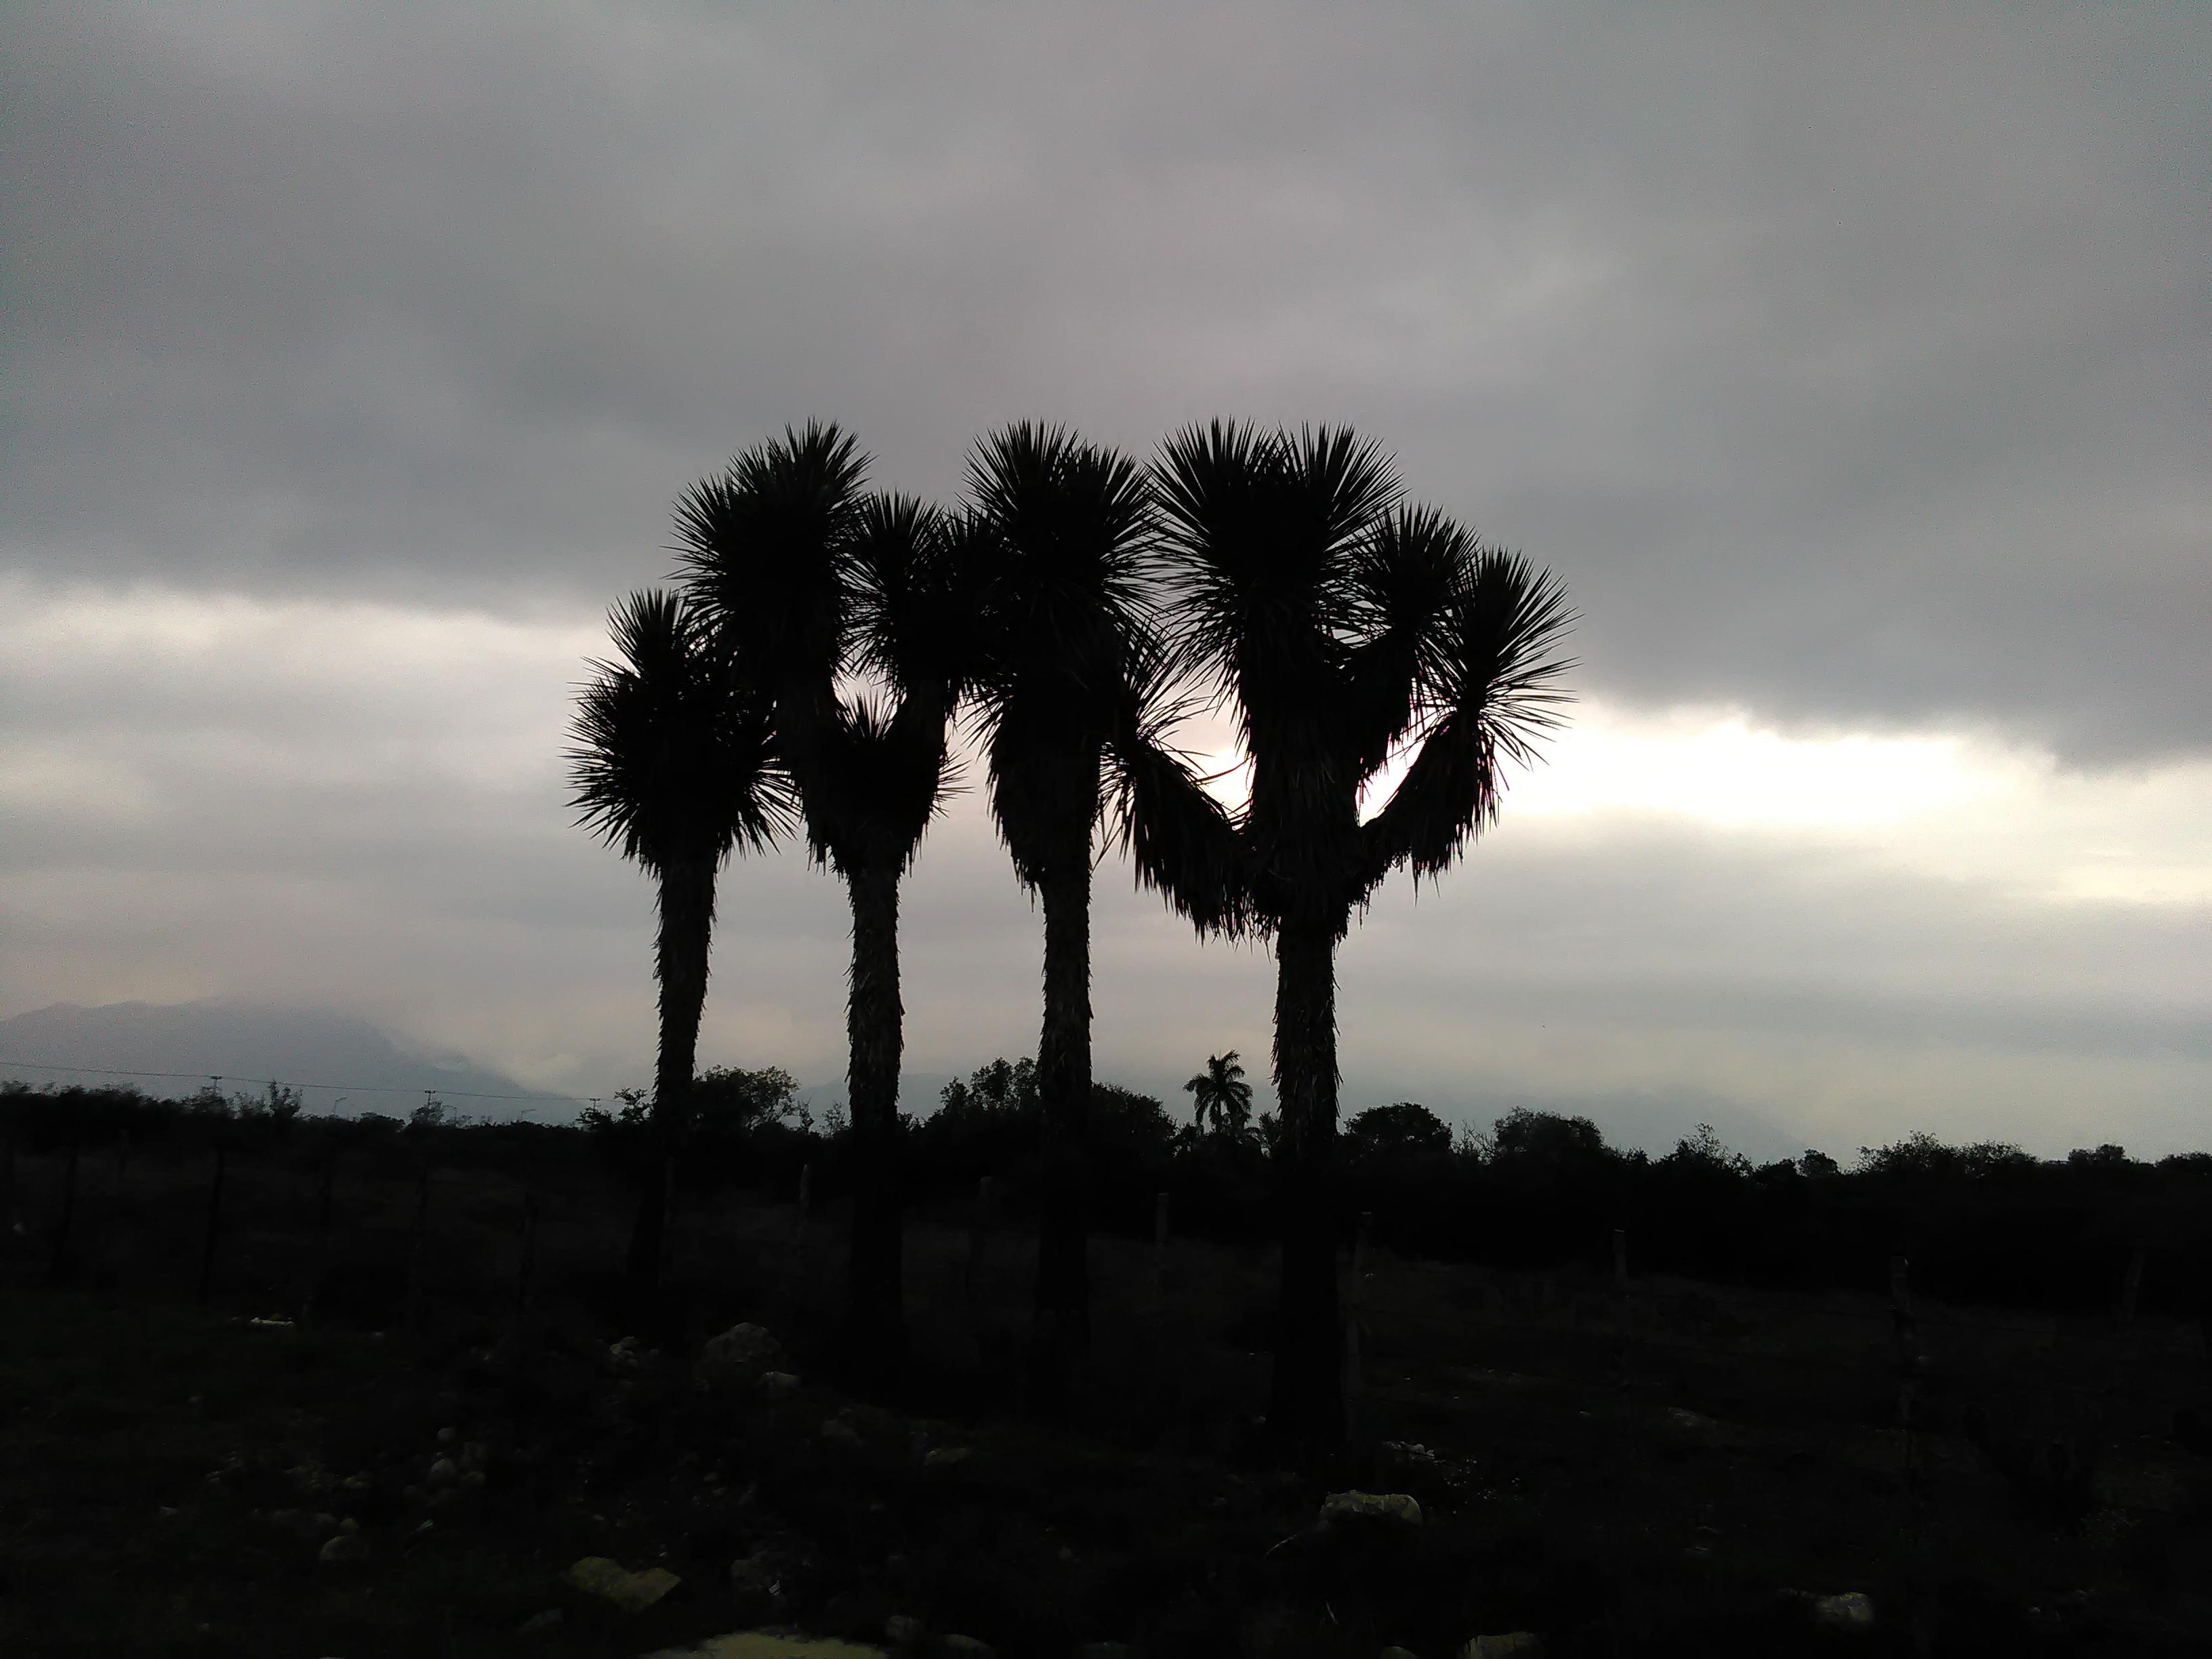 Sunset over joshua tree photo